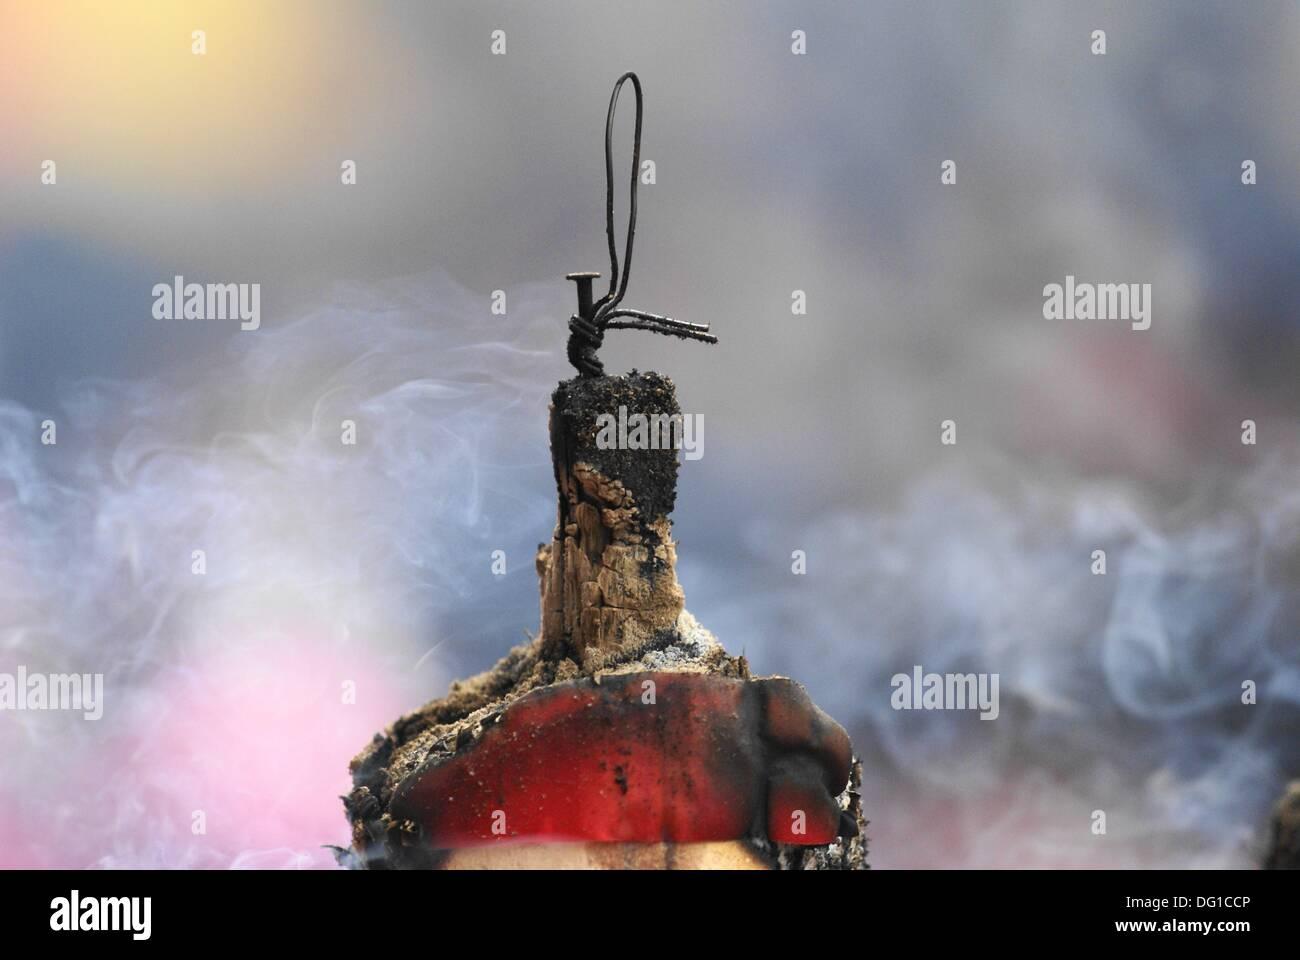 Siniawan, verrückt, Chinese New Year Festival, Malaysia Stockbild